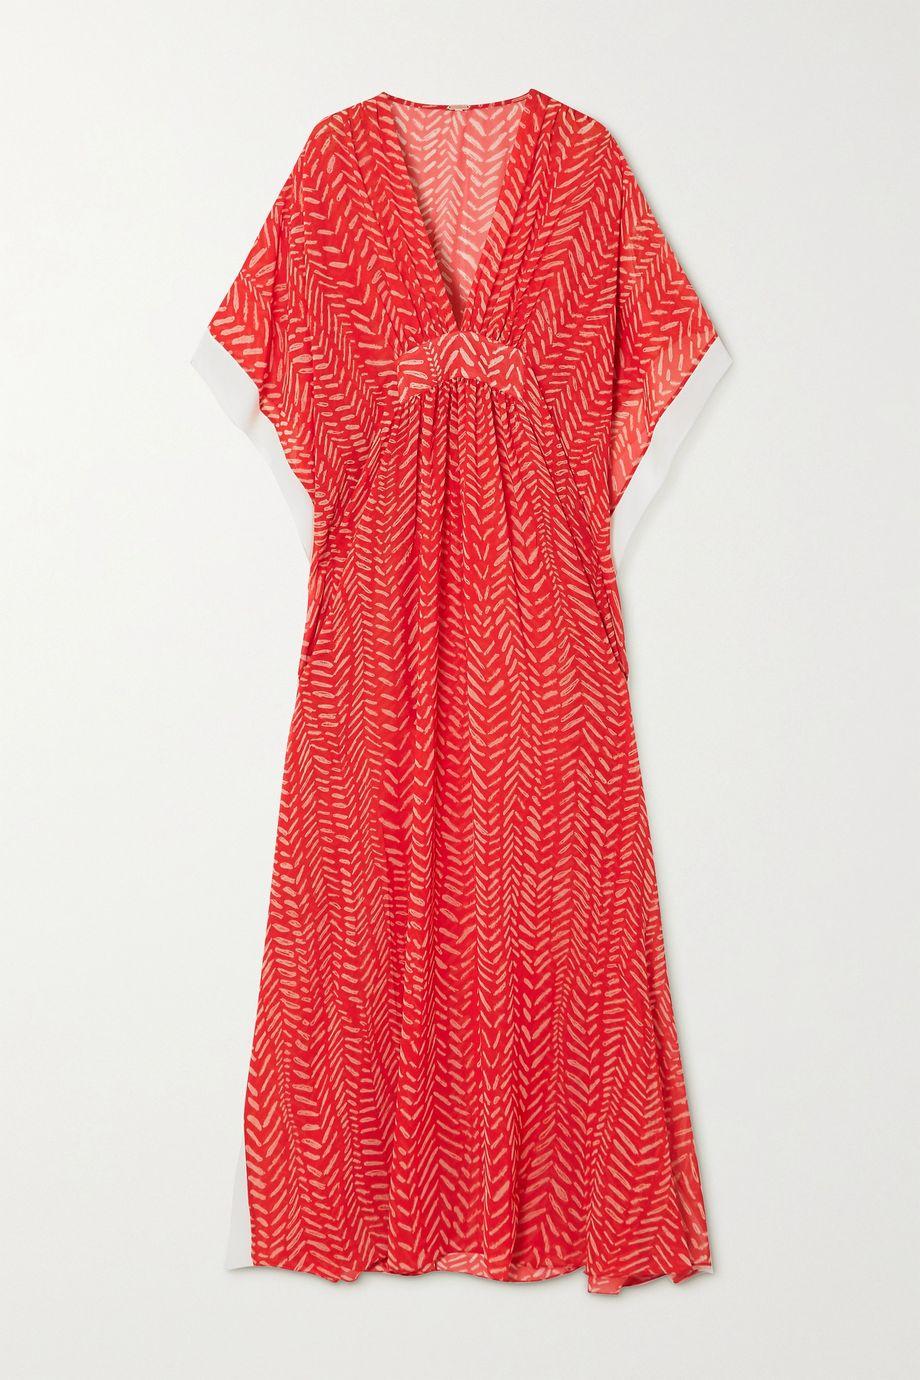 Johanna Ortiz Seychelles printed woven maxi dress